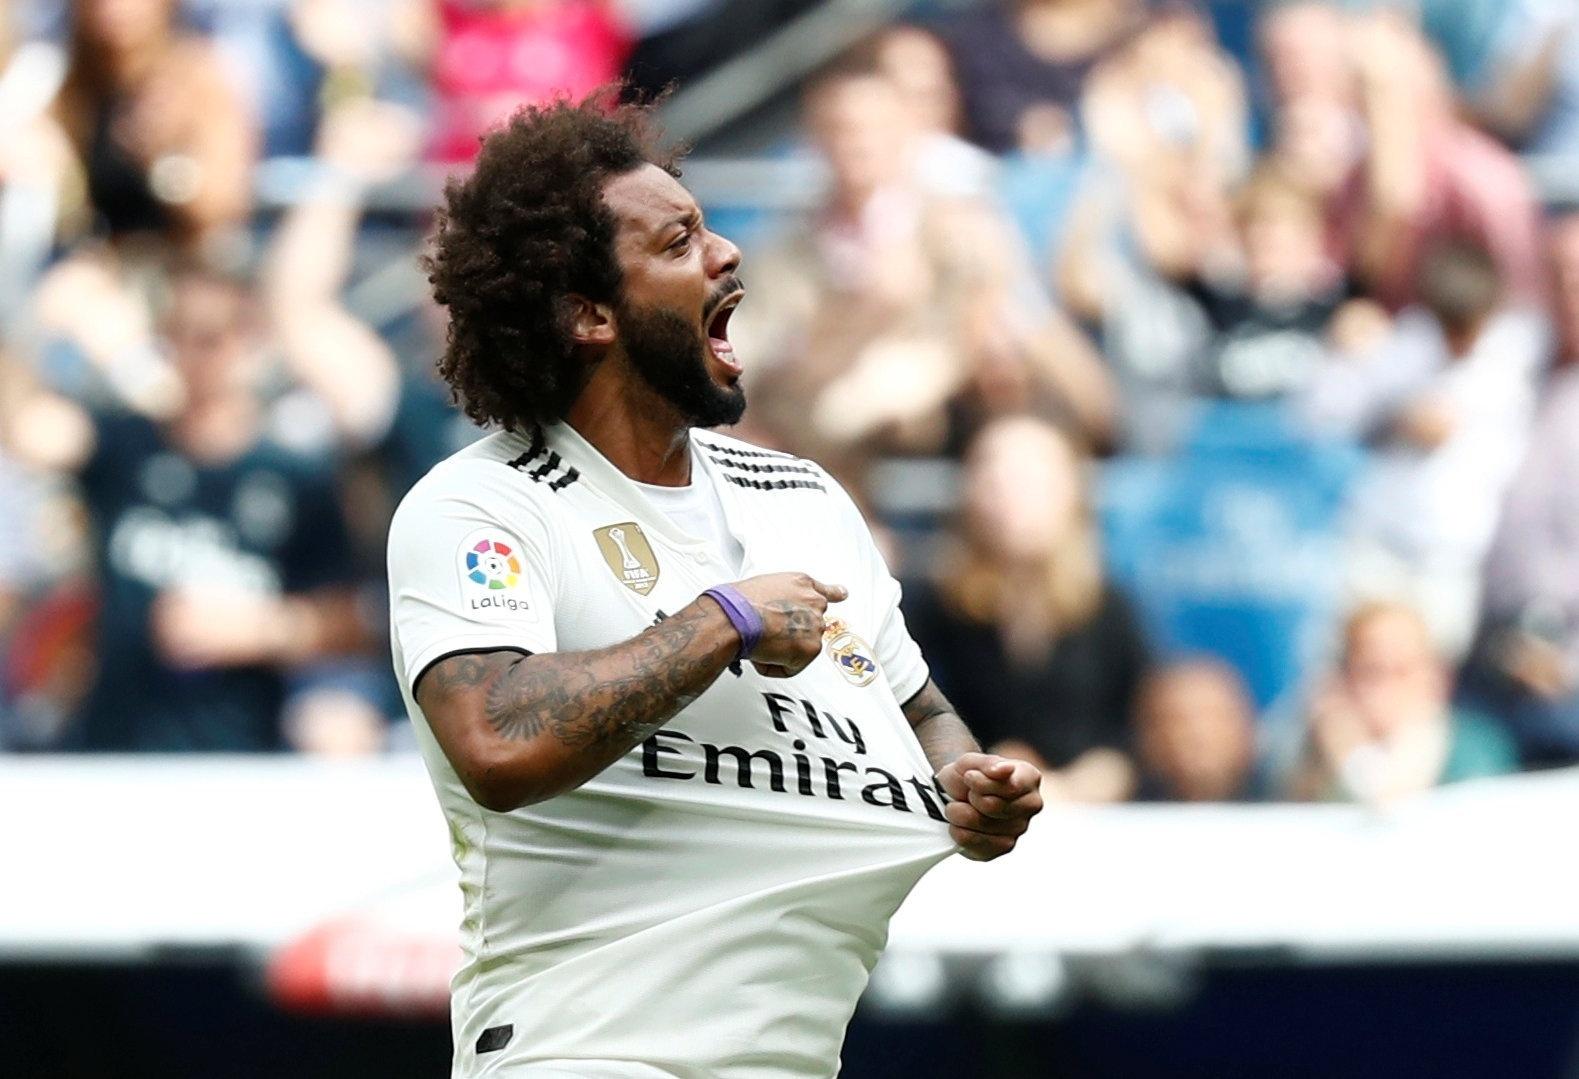 Marcelo comemora seu gol durante Real Madrid x Levante, neste sábado